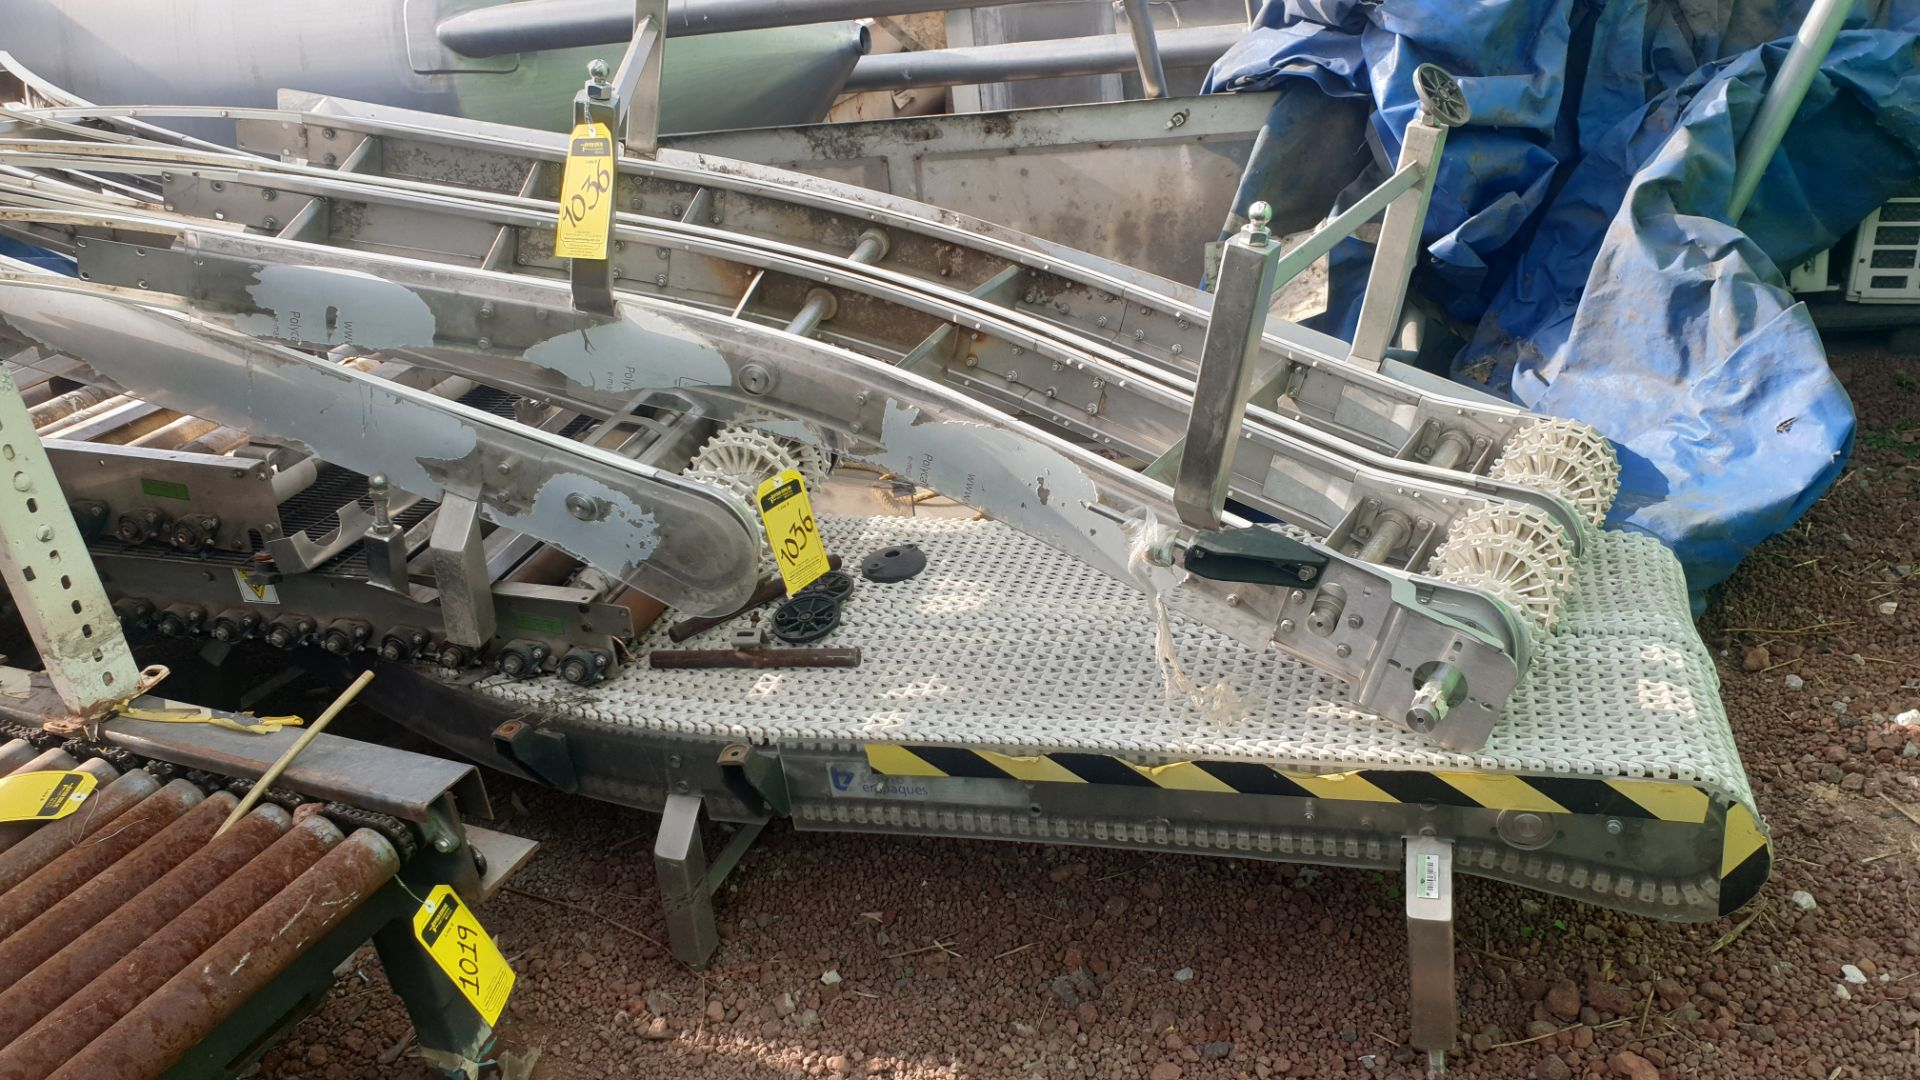 S conveyor belt batch. Please inspect - Image 4 of 9